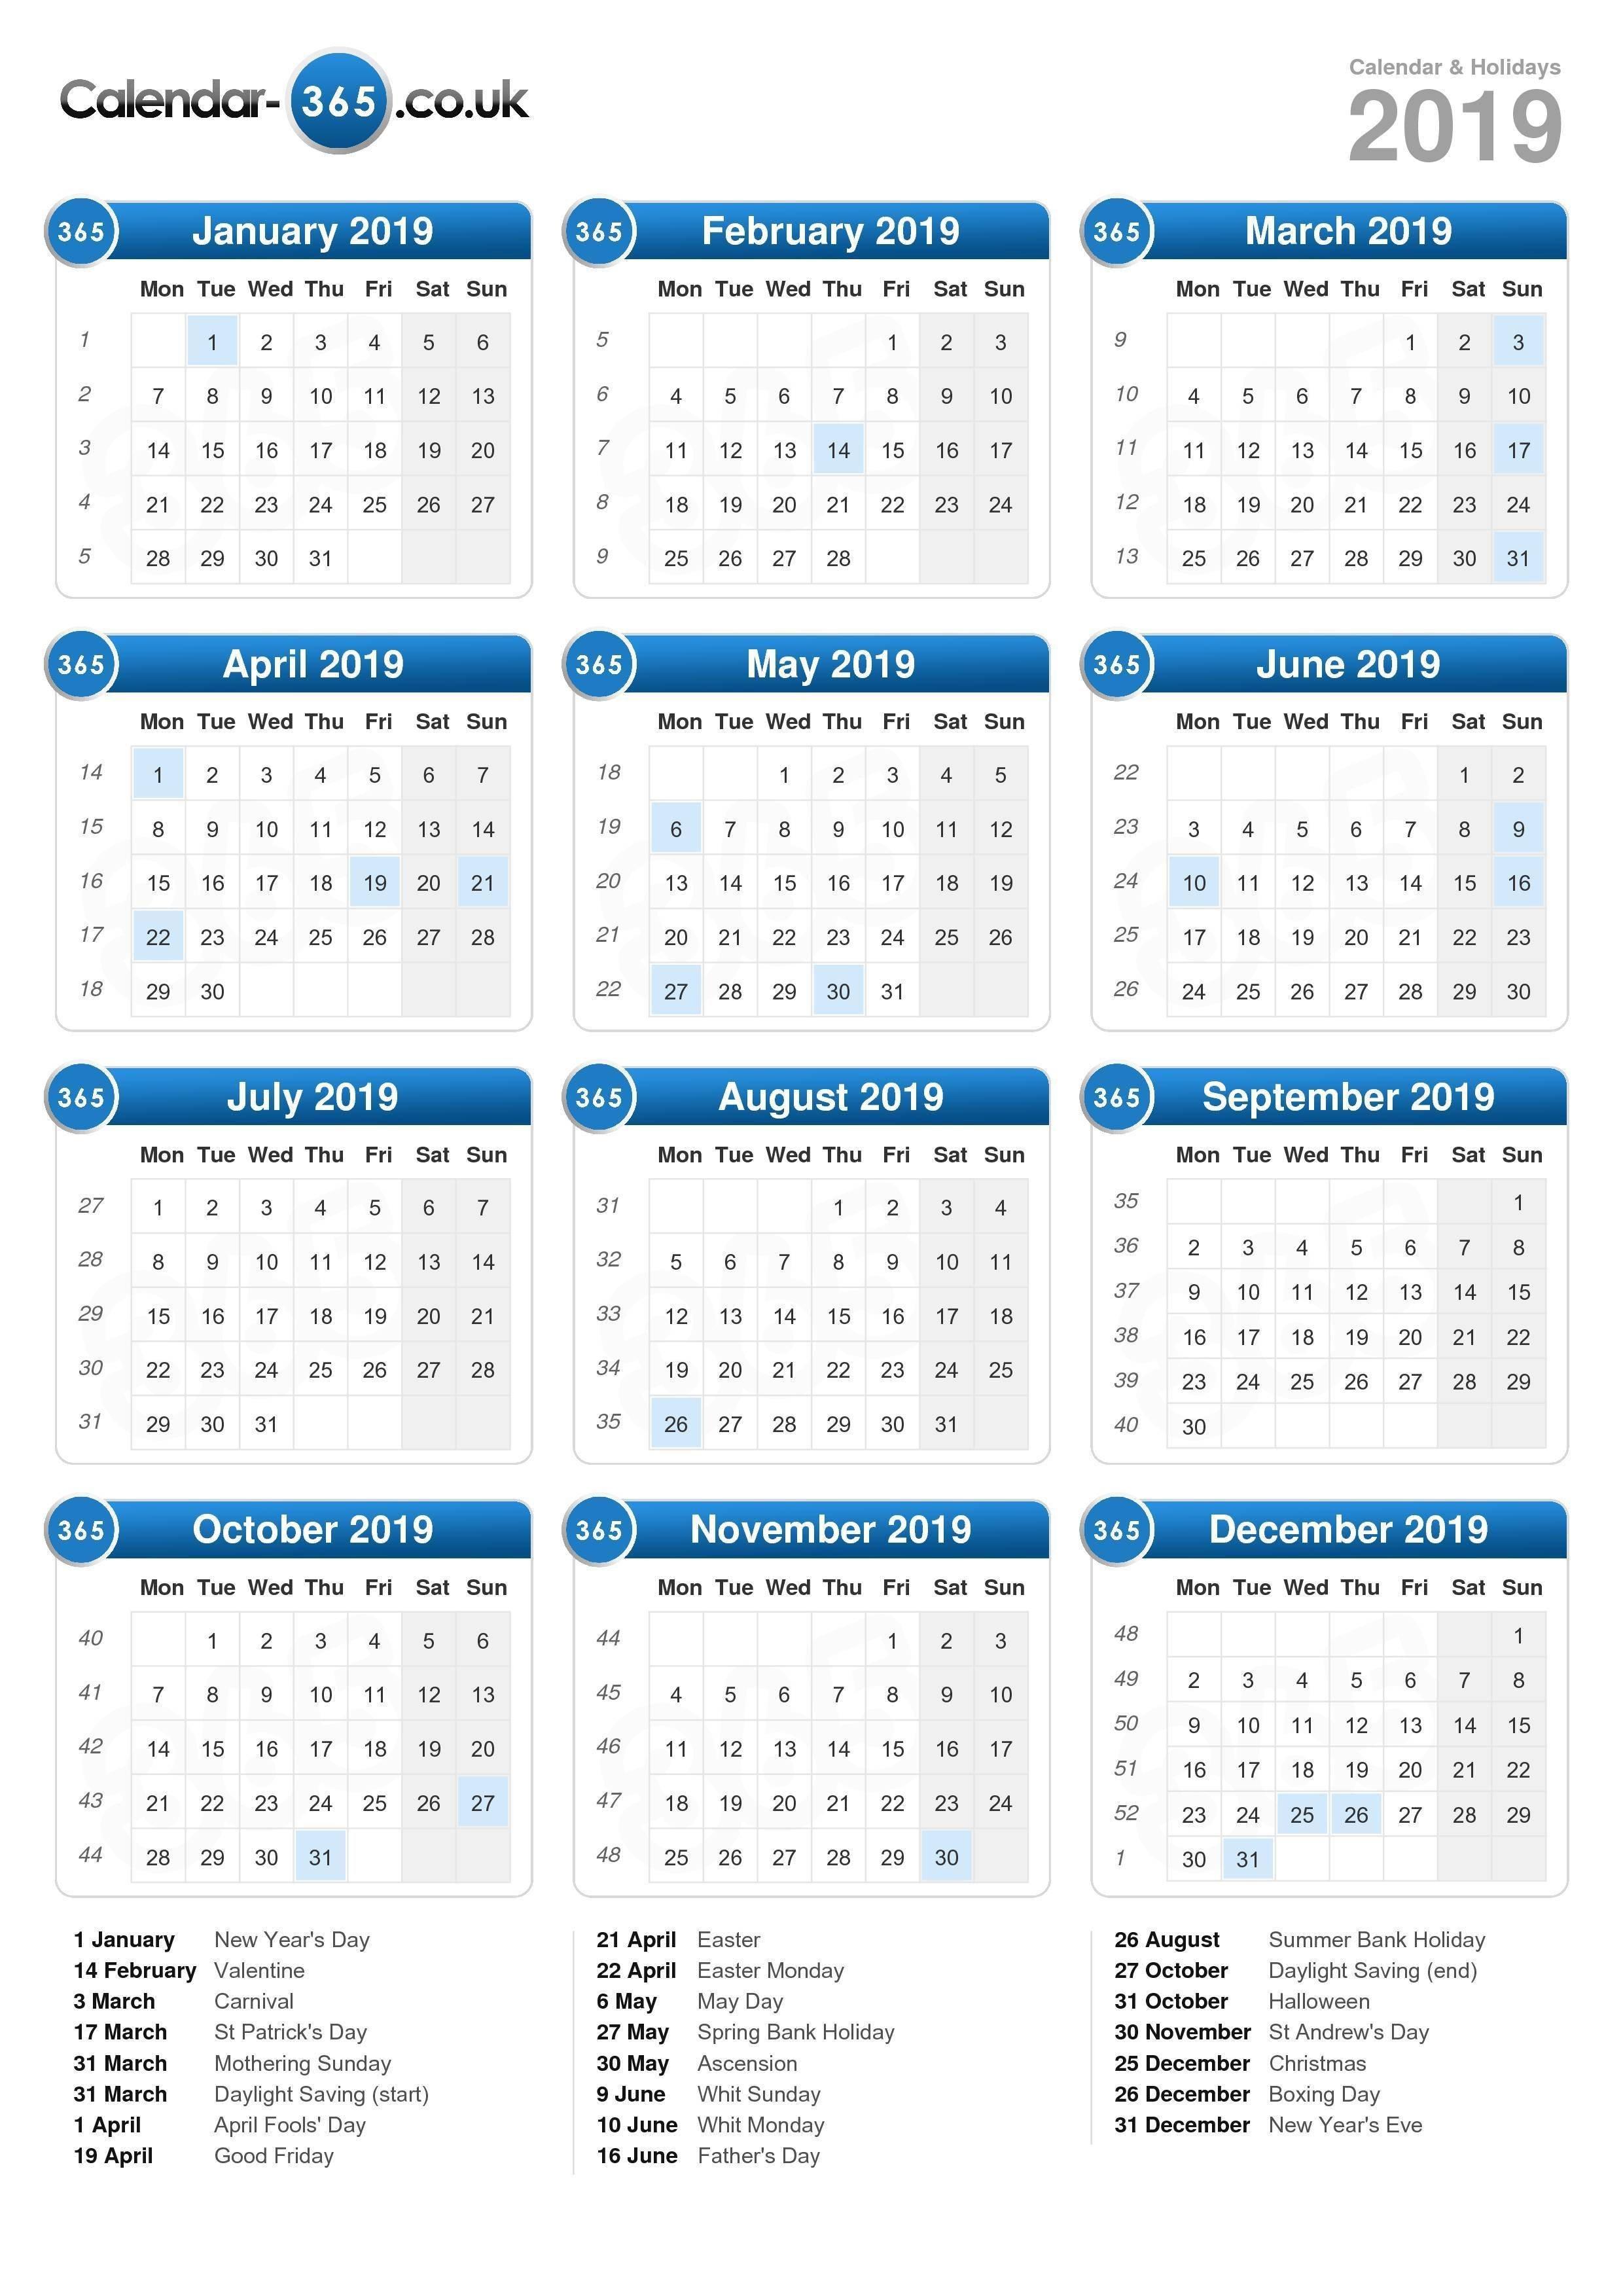 Calendar 2019 Calendar 2019 Bank Holidays